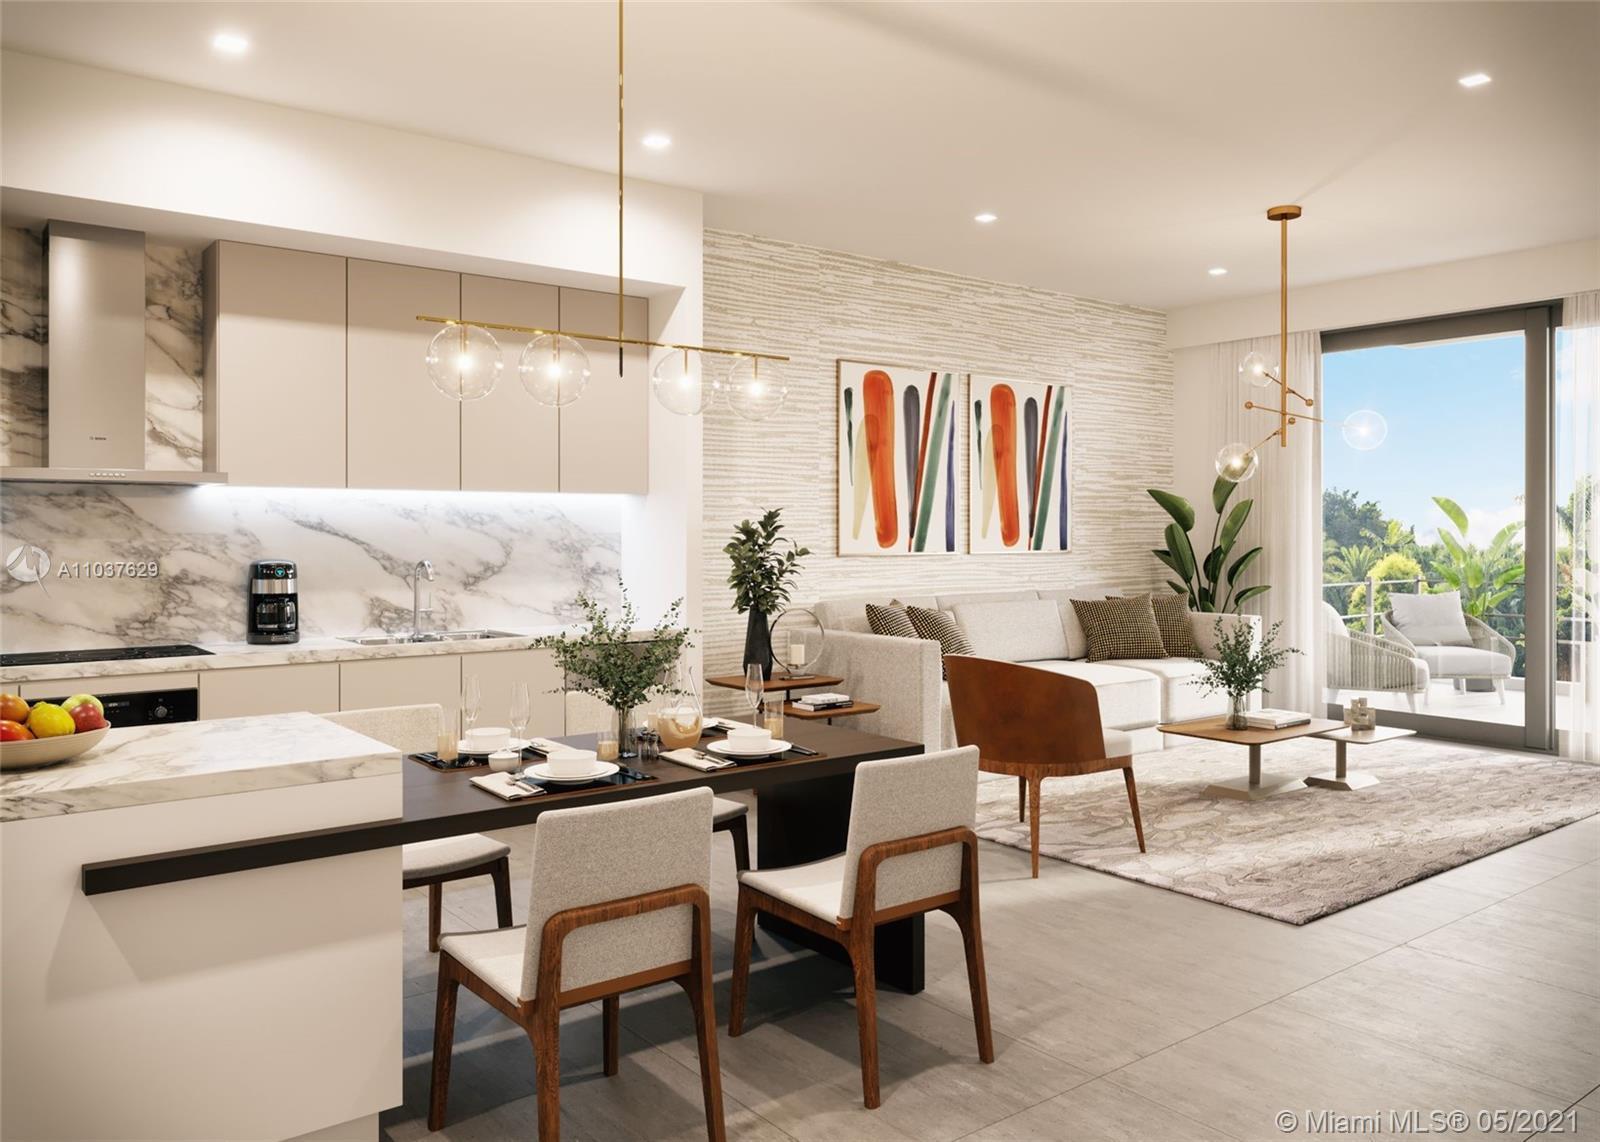 Spacious 1br/1.5 bath brand new condo in the heart of South Beach. 10ft ceilings, ceramic tile floor